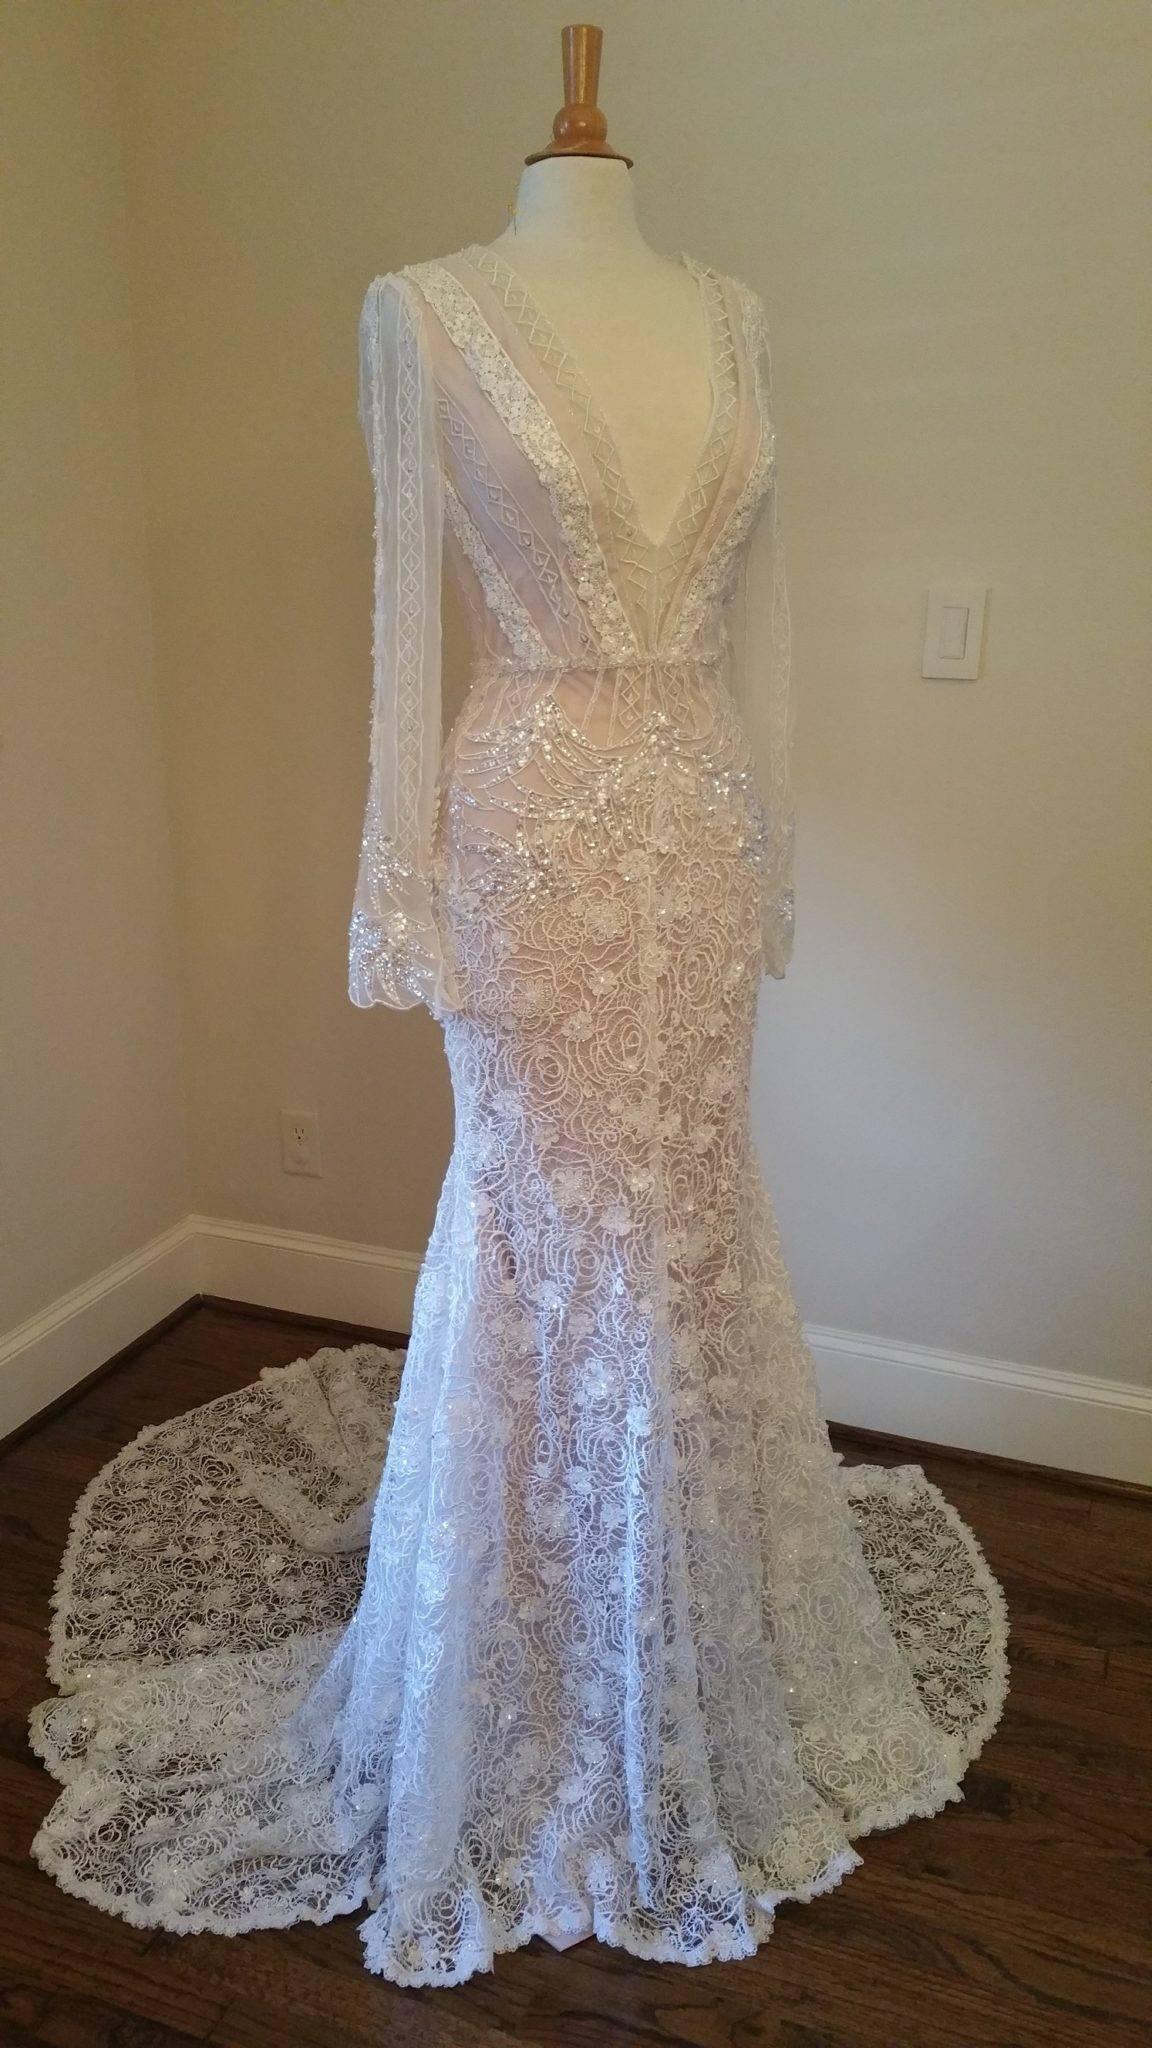 df002c52ca6e Long Sleeve wedding dress inspired by Inbal Dror made by Darius Cordell